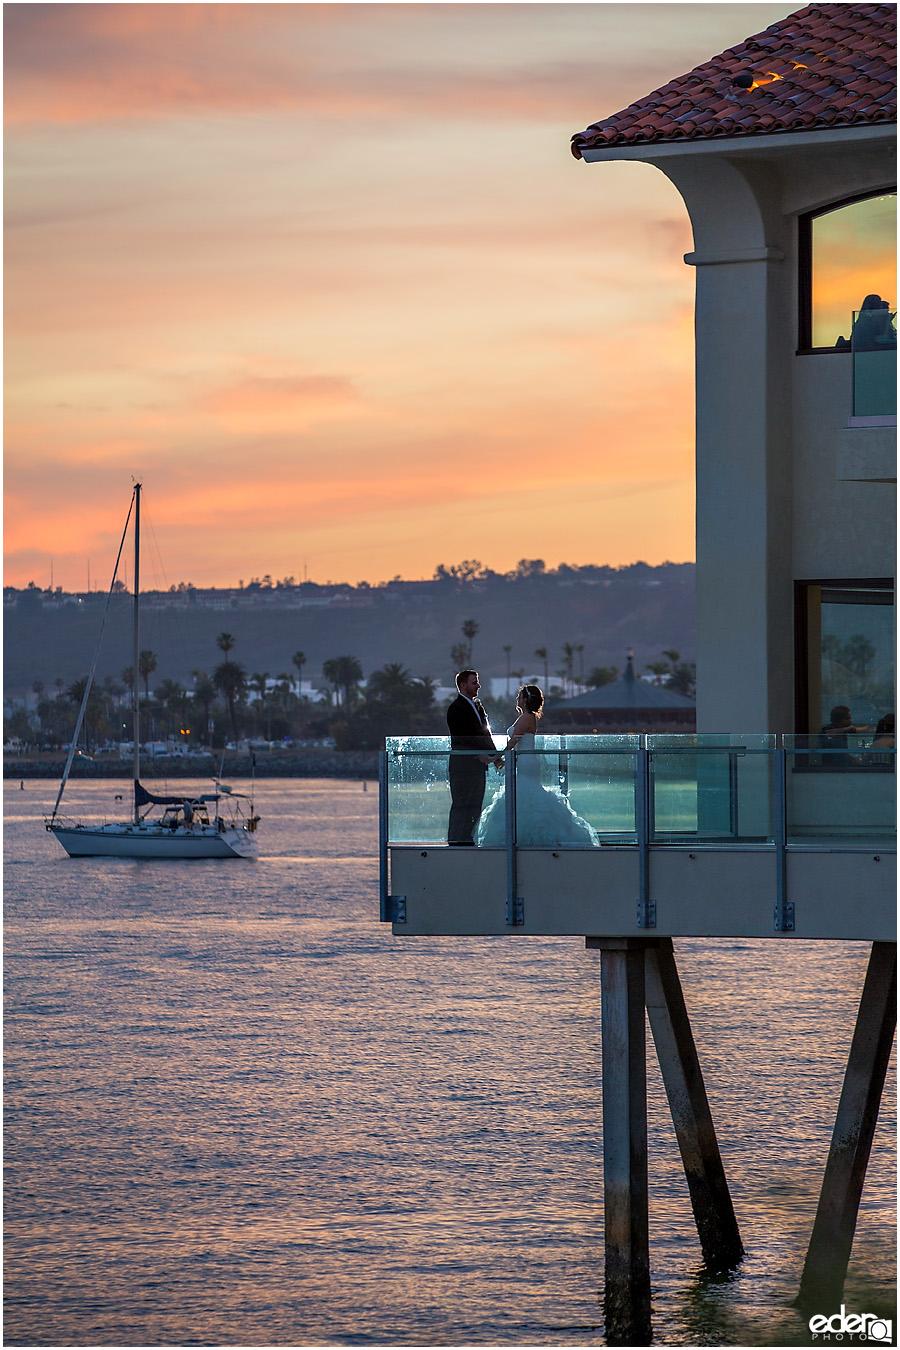 Sunset photos at Tom Ham's Lighthouse